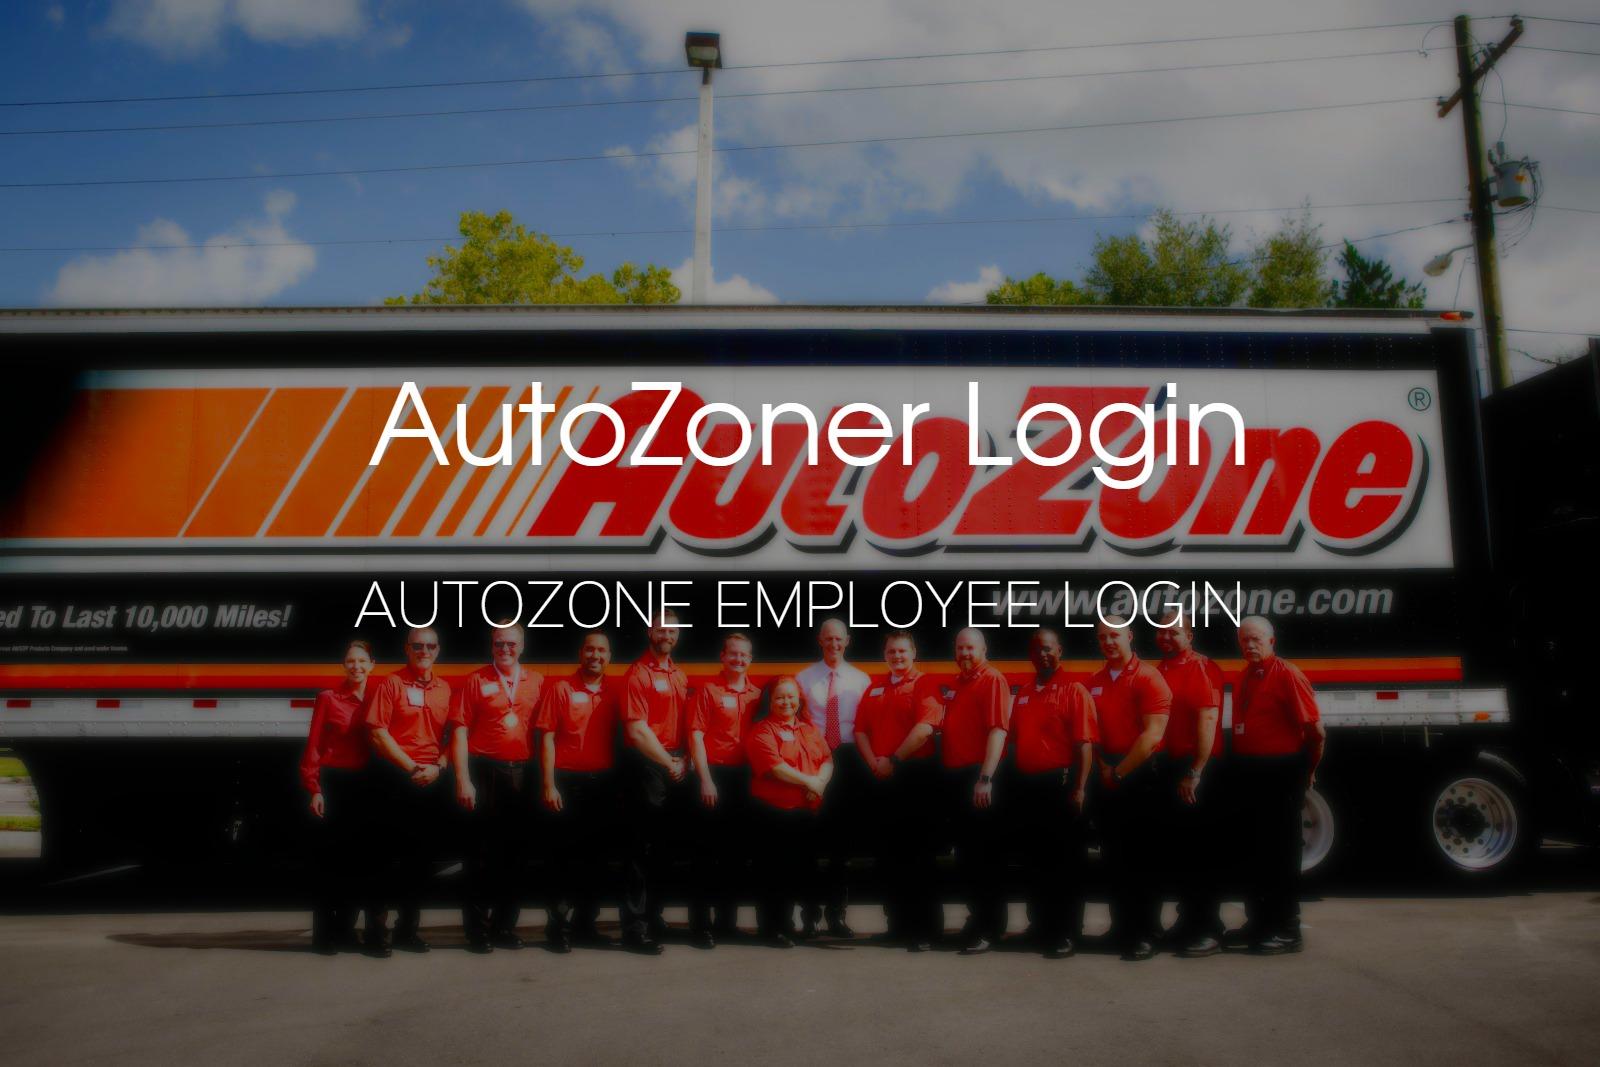 AutoZoner Employee Login